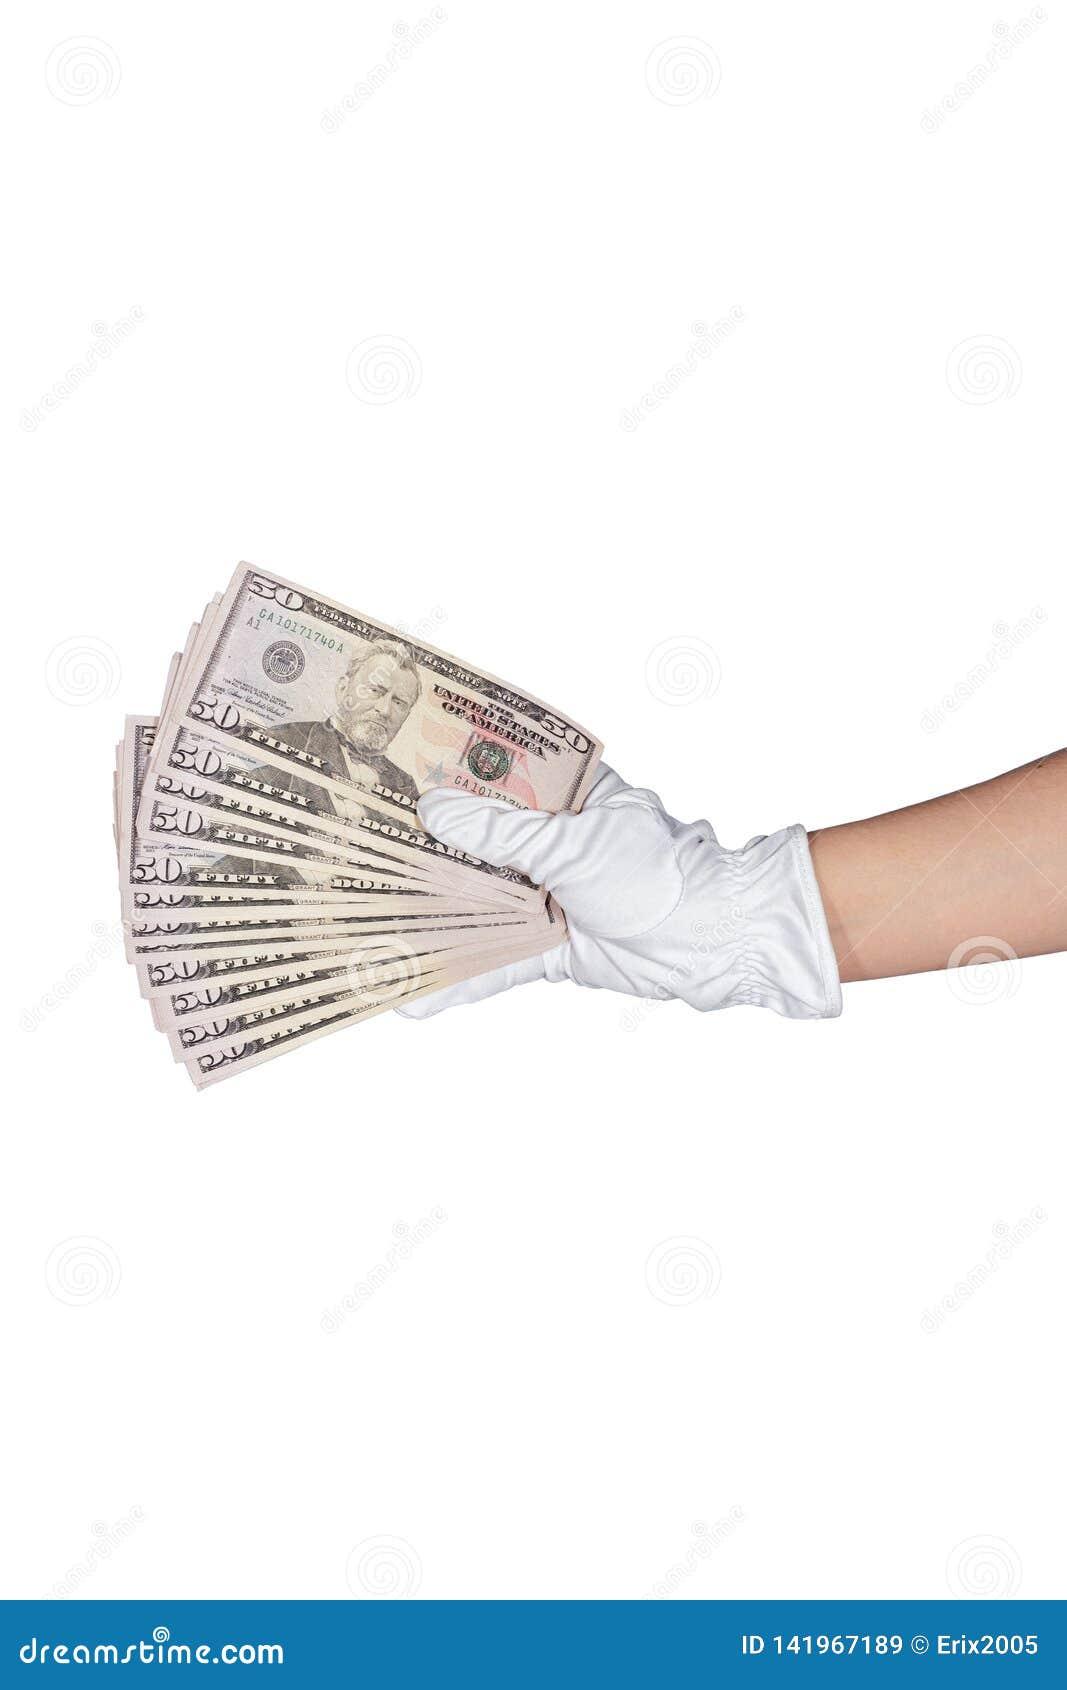 Hand in gloves holding 50 dollar cash